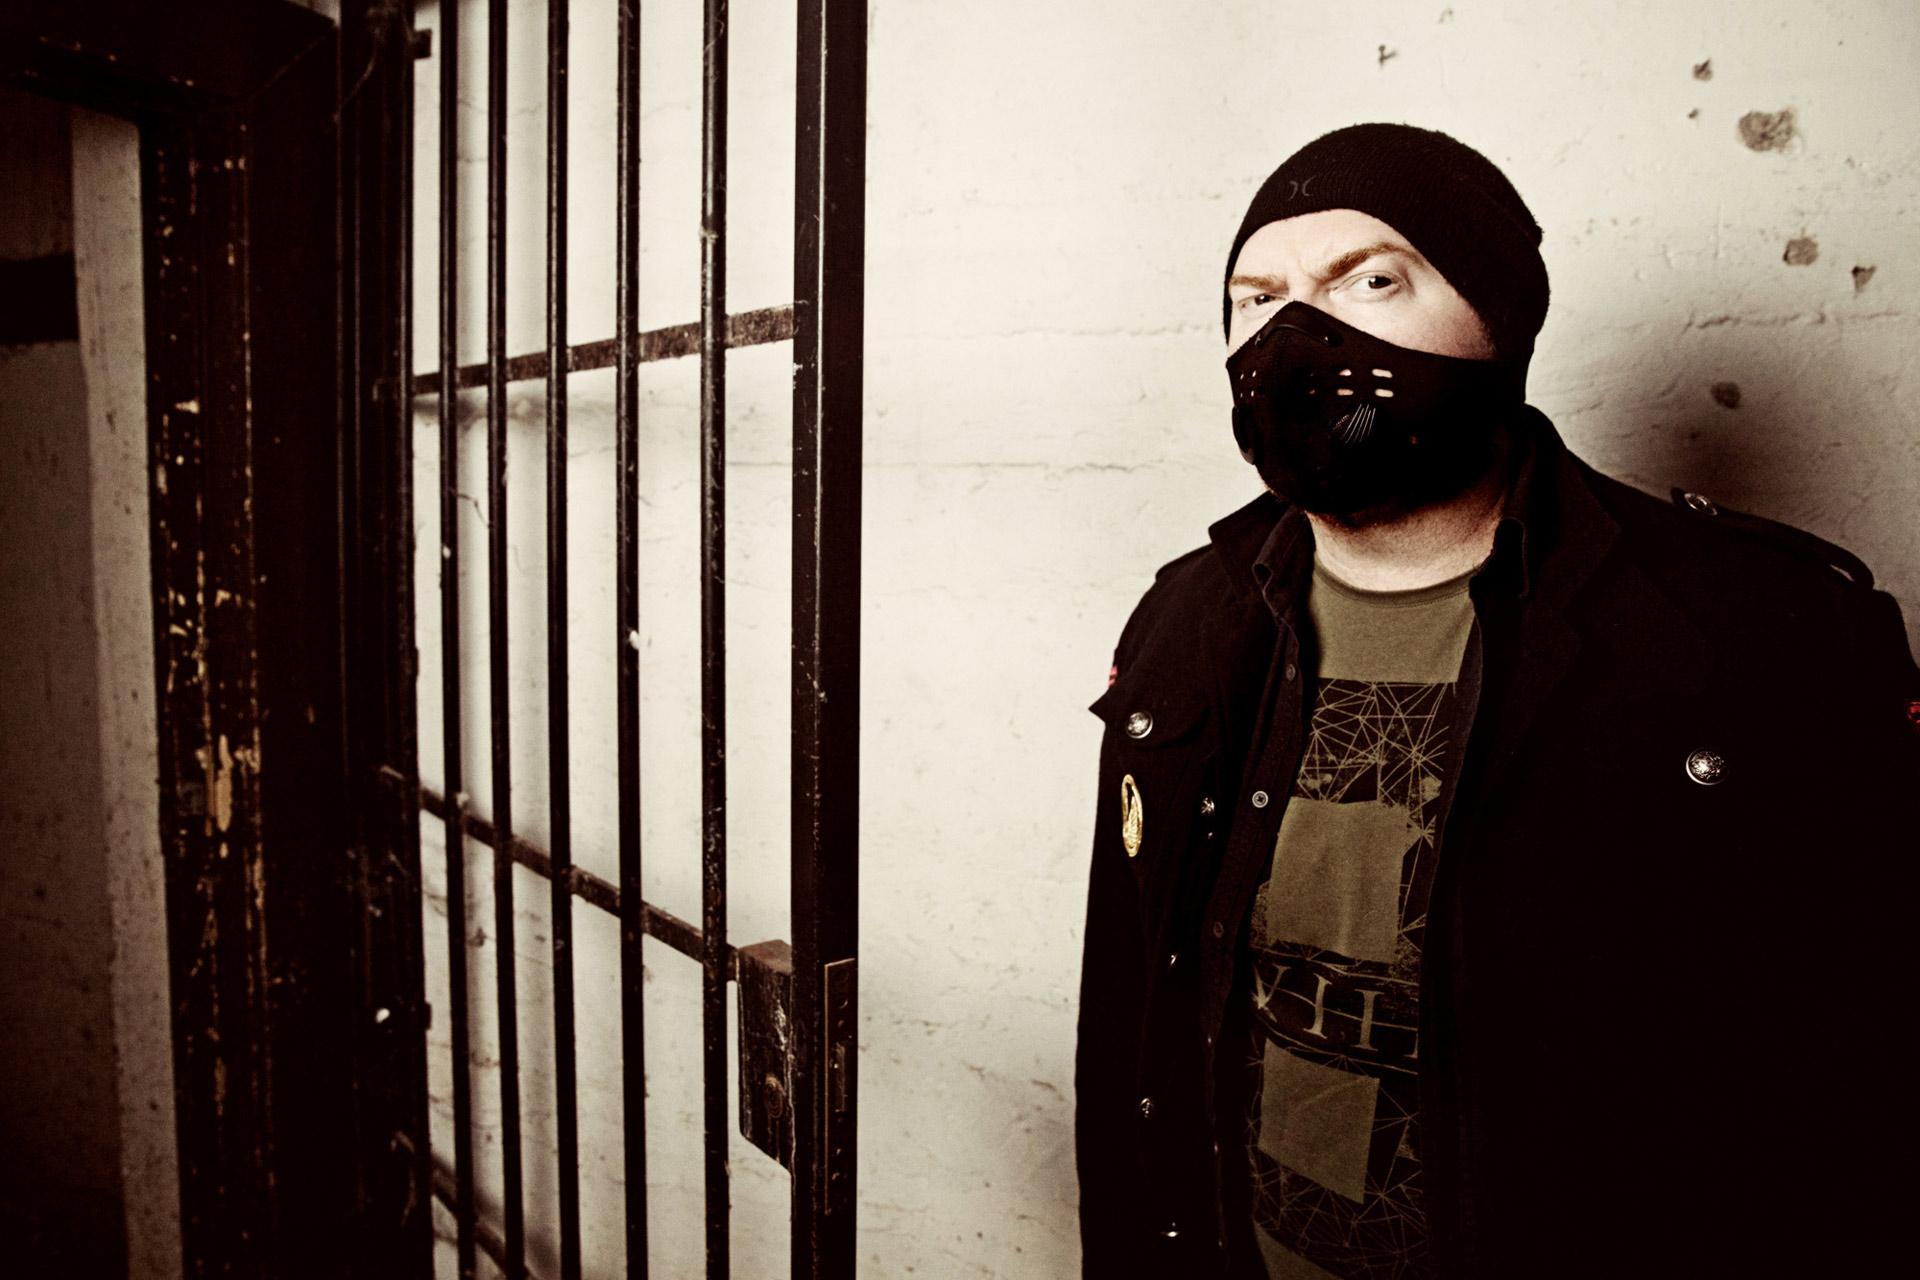 Dean from metal, thrash, rock, band meshiaak by karina wells